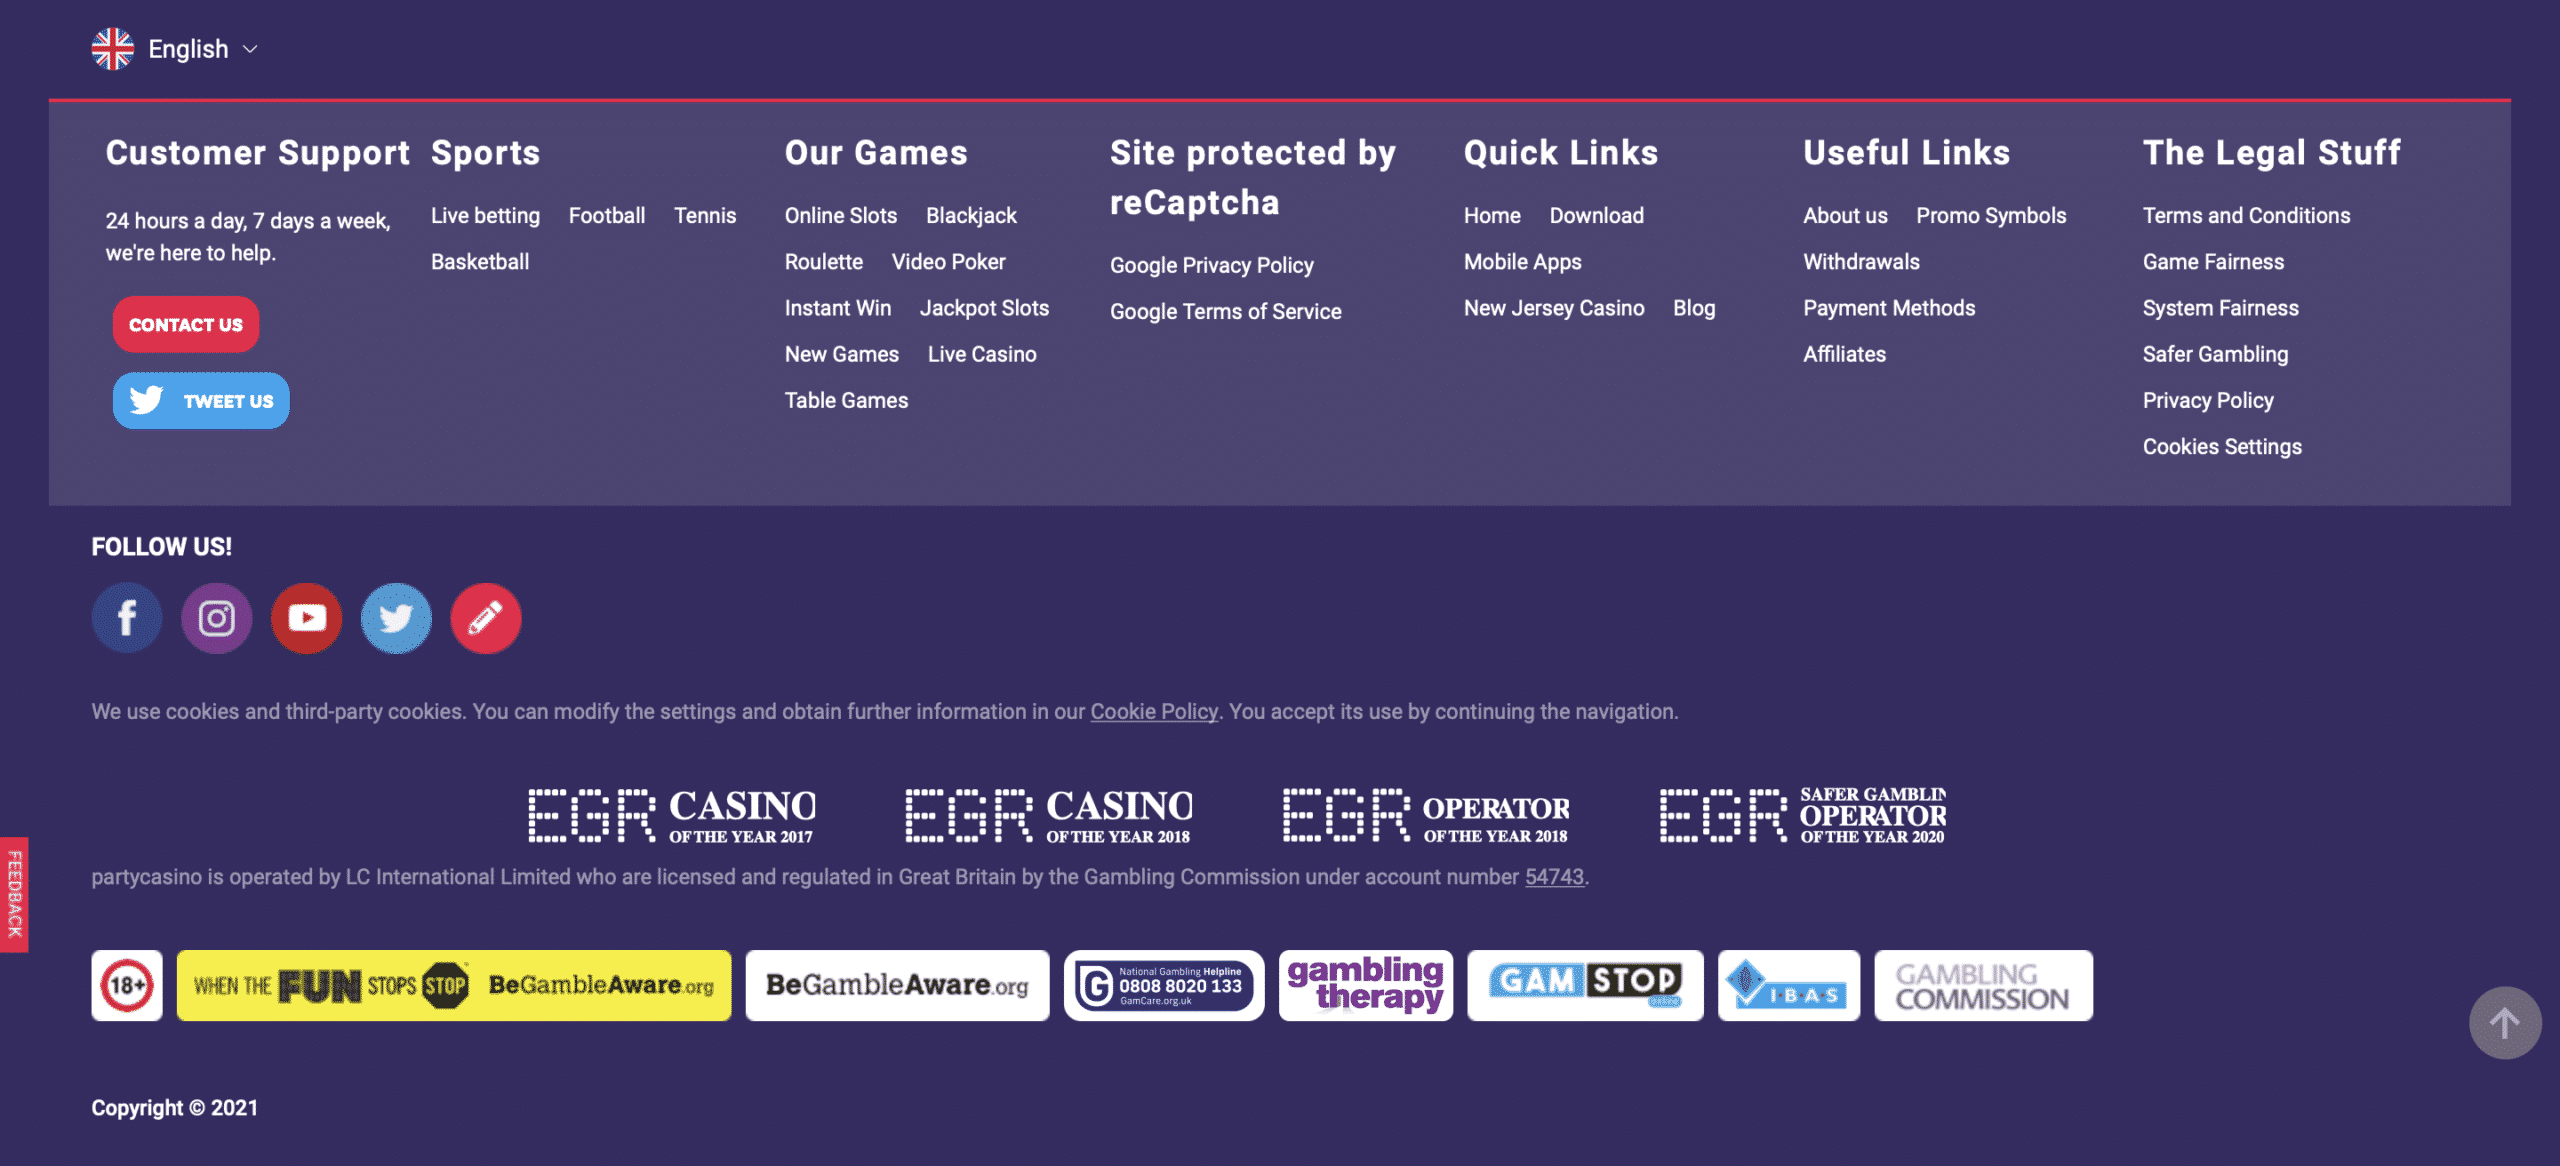 PartyCasino UKGC License Information